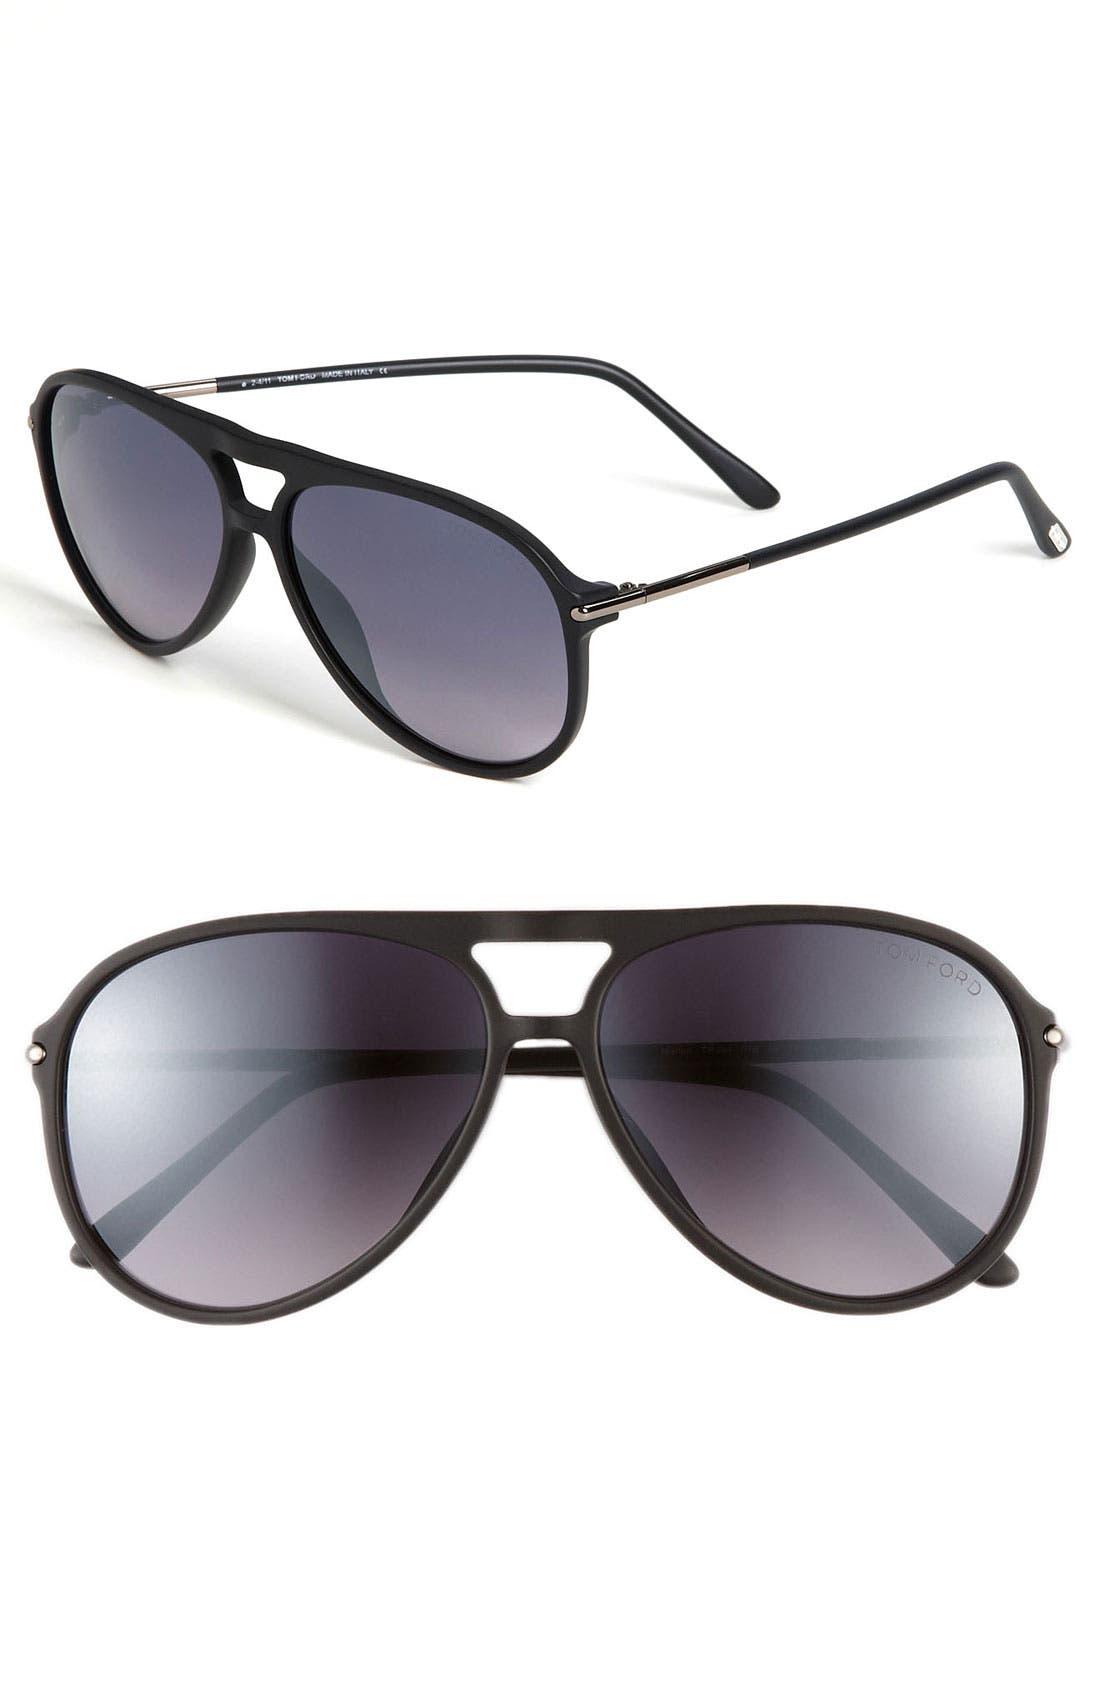 Alternate Image 1 Selected - Tom Ford 59mm Aviator Sunglasses